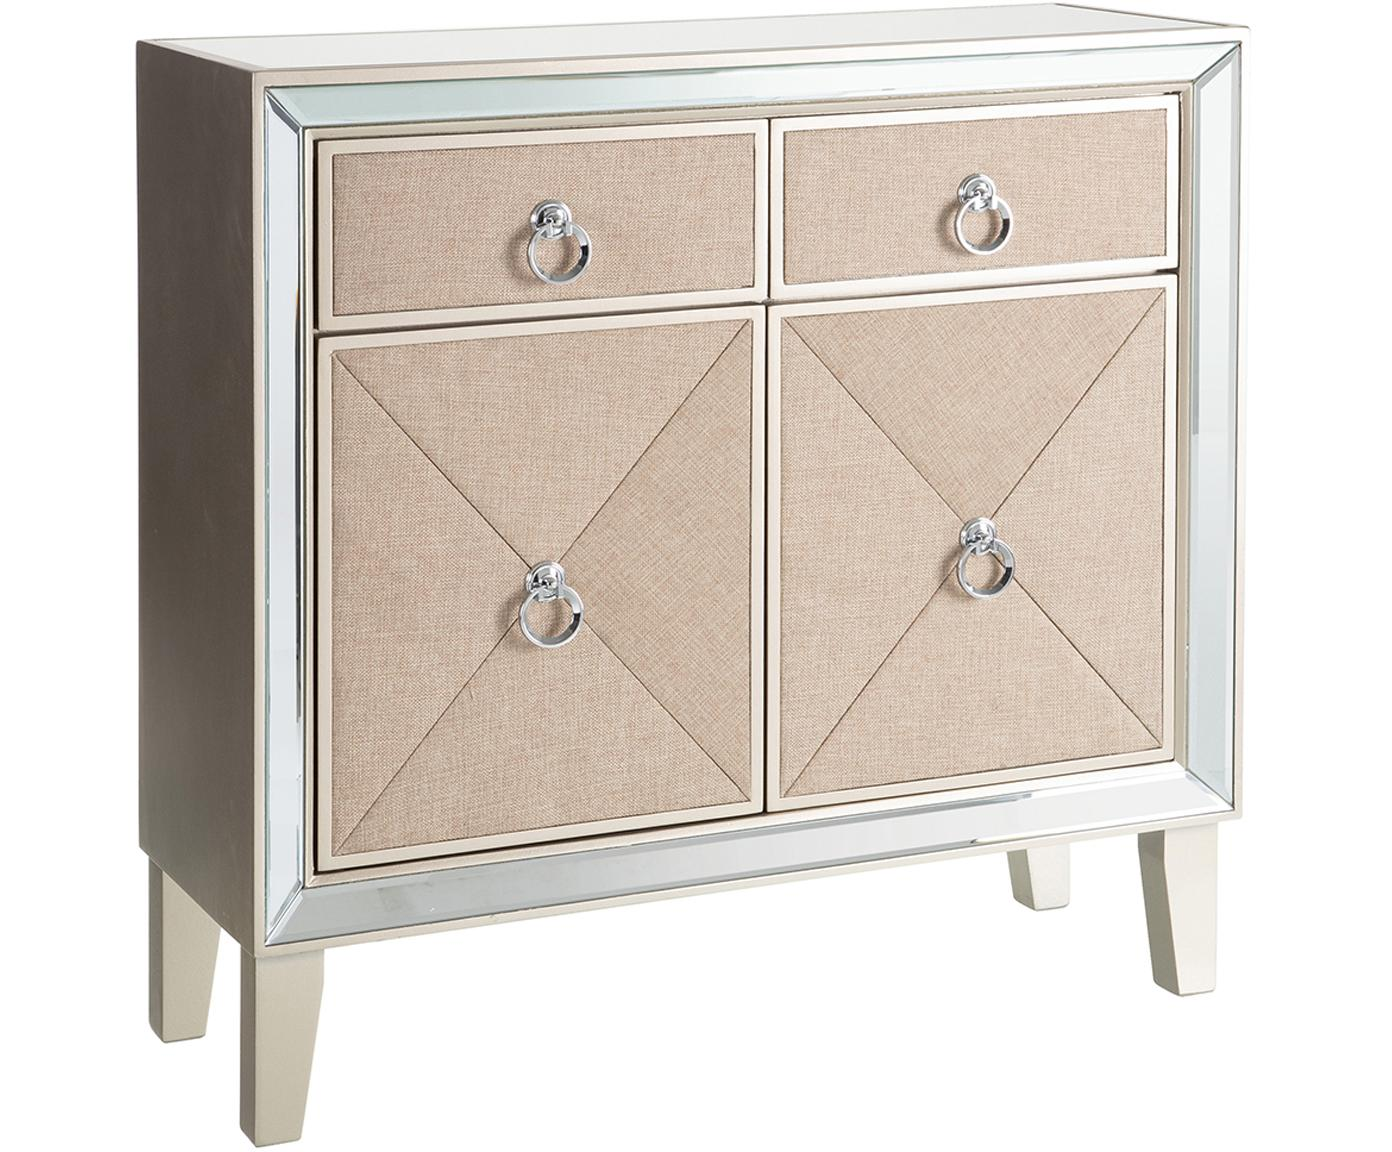 Consola Miriam, Blanco crema, beige, An 80 x Al 81 cm